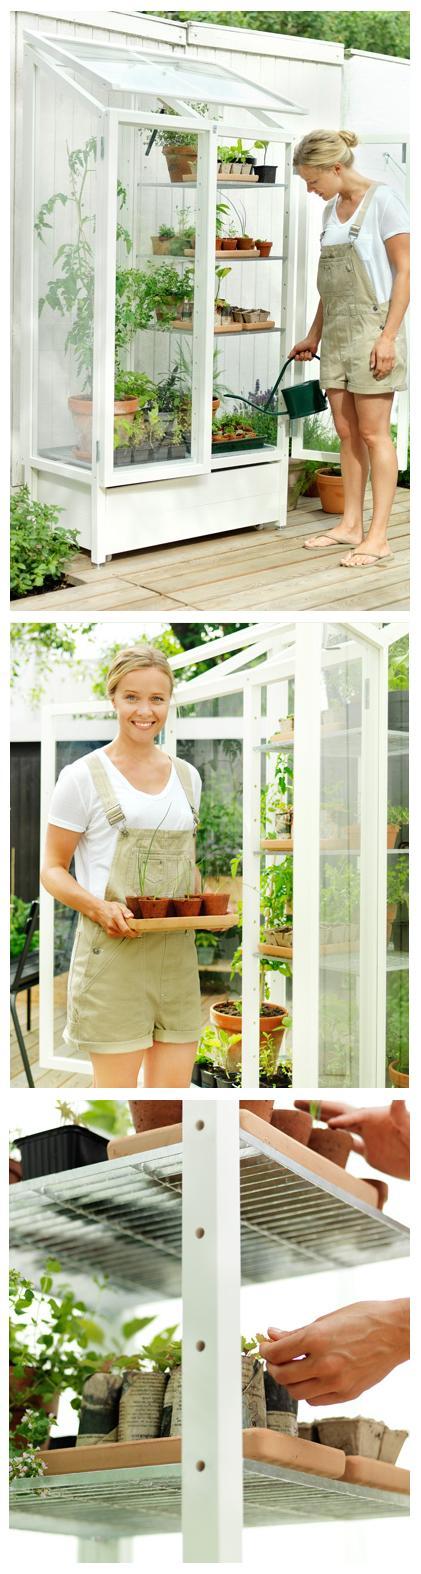 Amazing mini-greenhouse